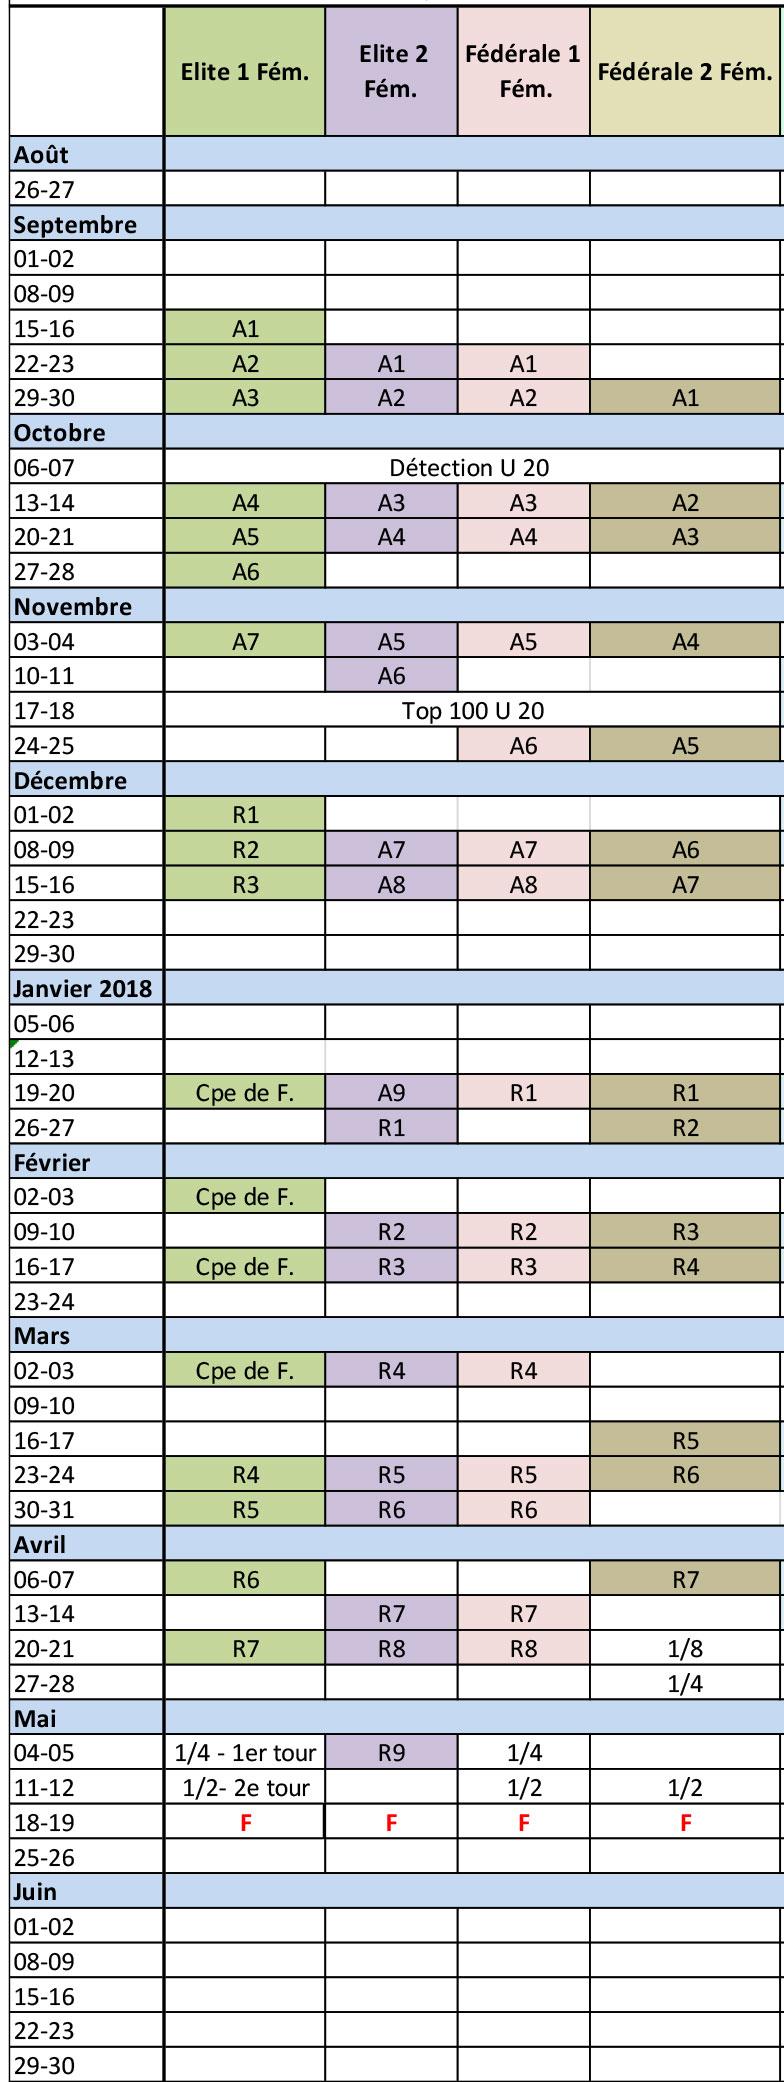 calendrier seniors féminines 2018-2019